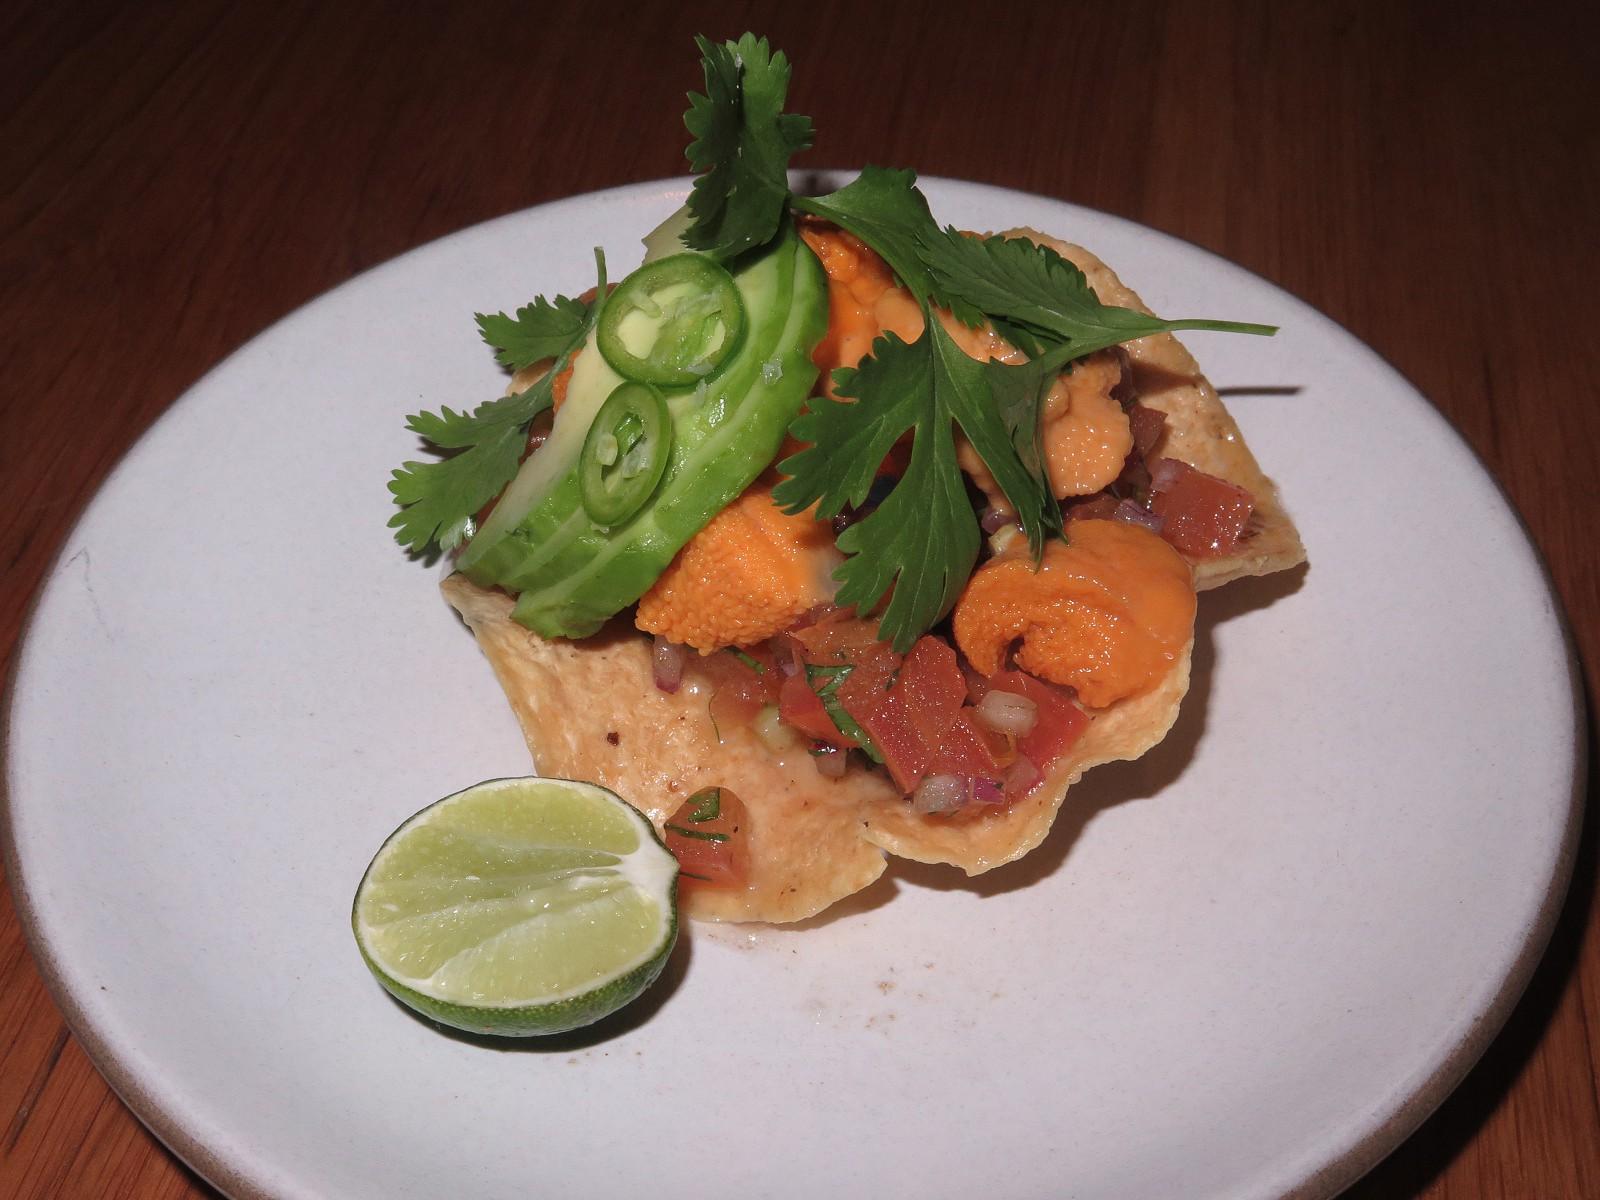 Uni tostada, avocado, bone marrow salsa, cucumber